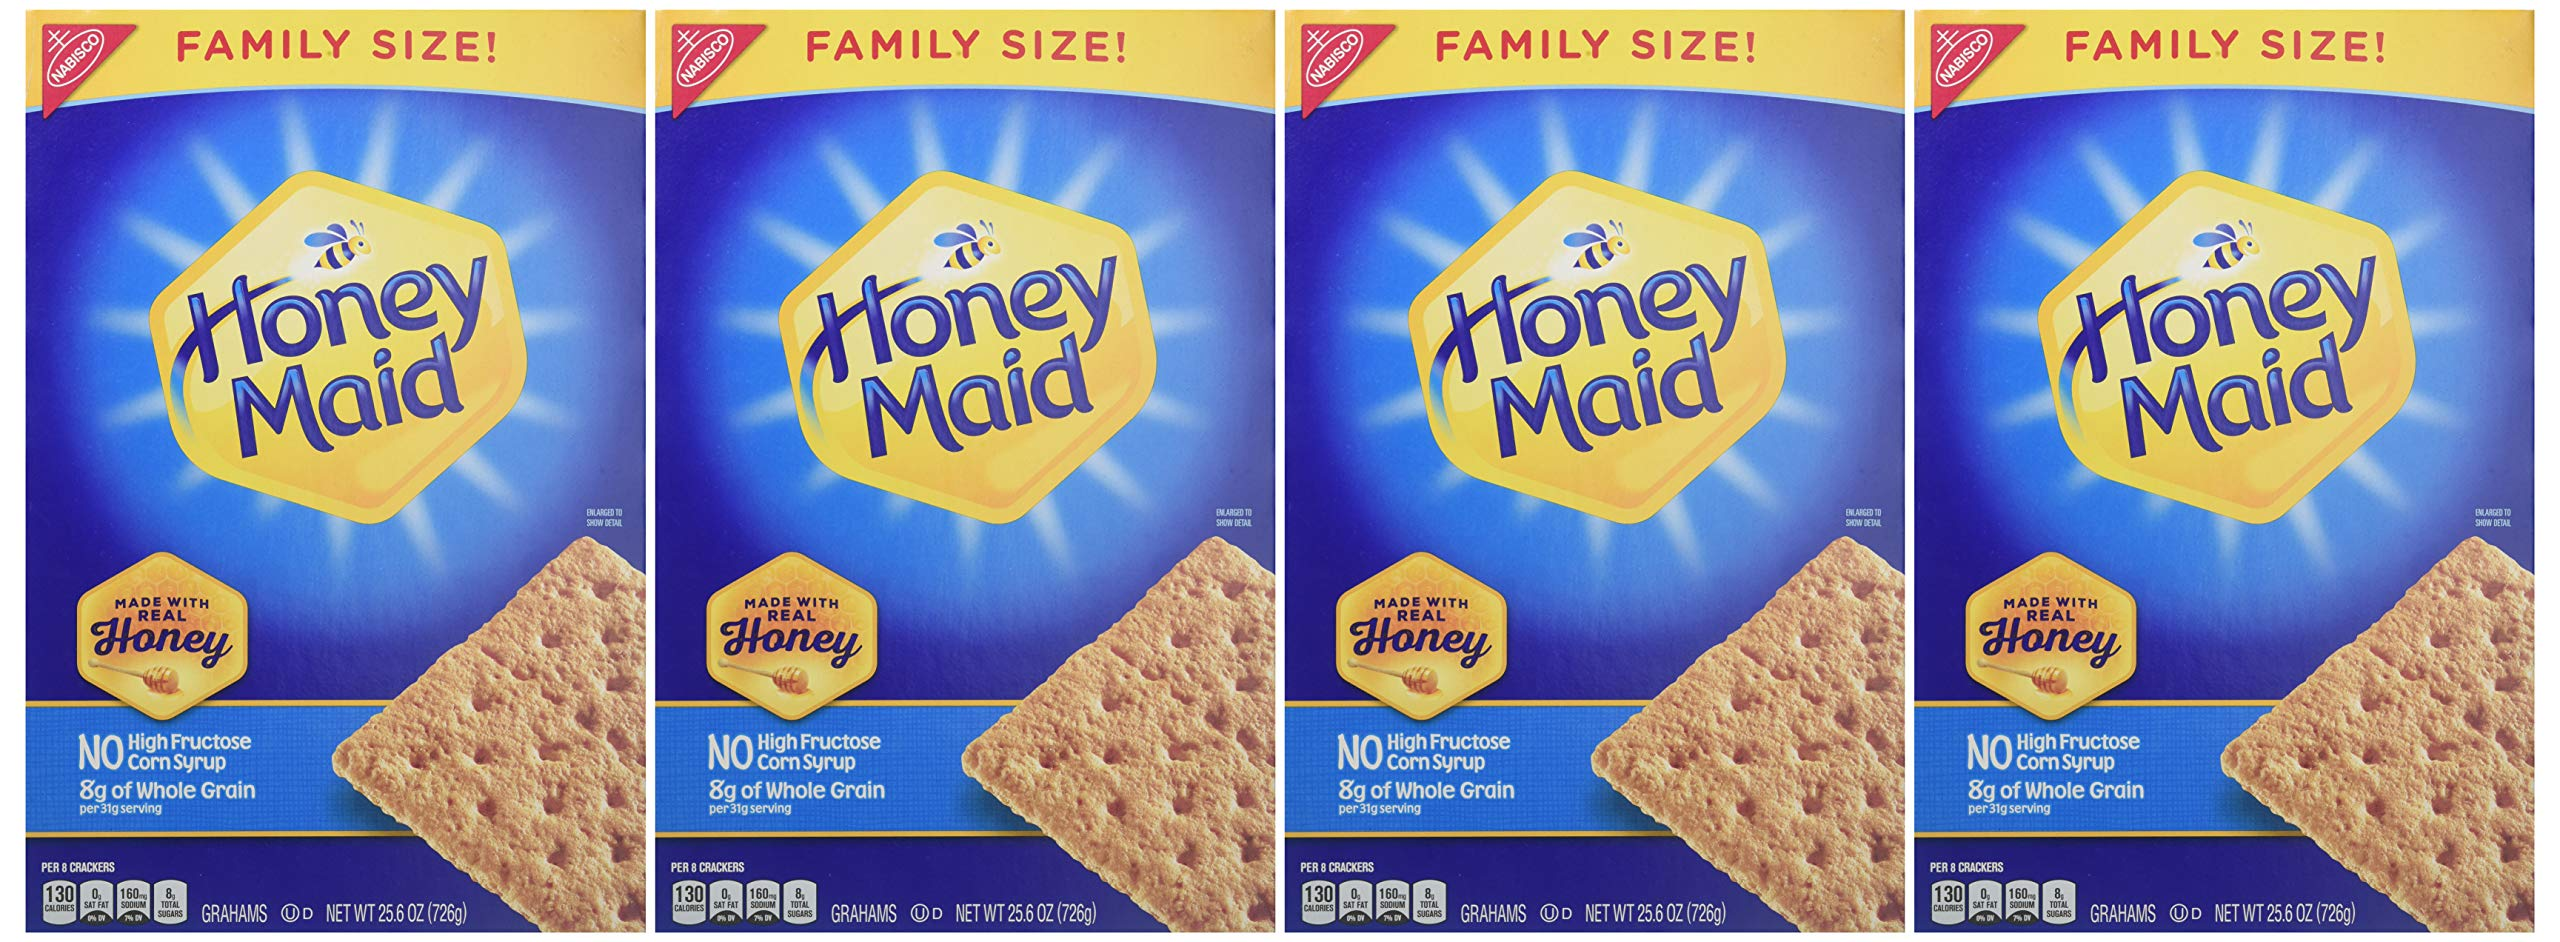 Honey Maid Honey Graham Crackers - Family Size, 25.6 Ounce (Pack of 6) by Honey Maid (Image #2)